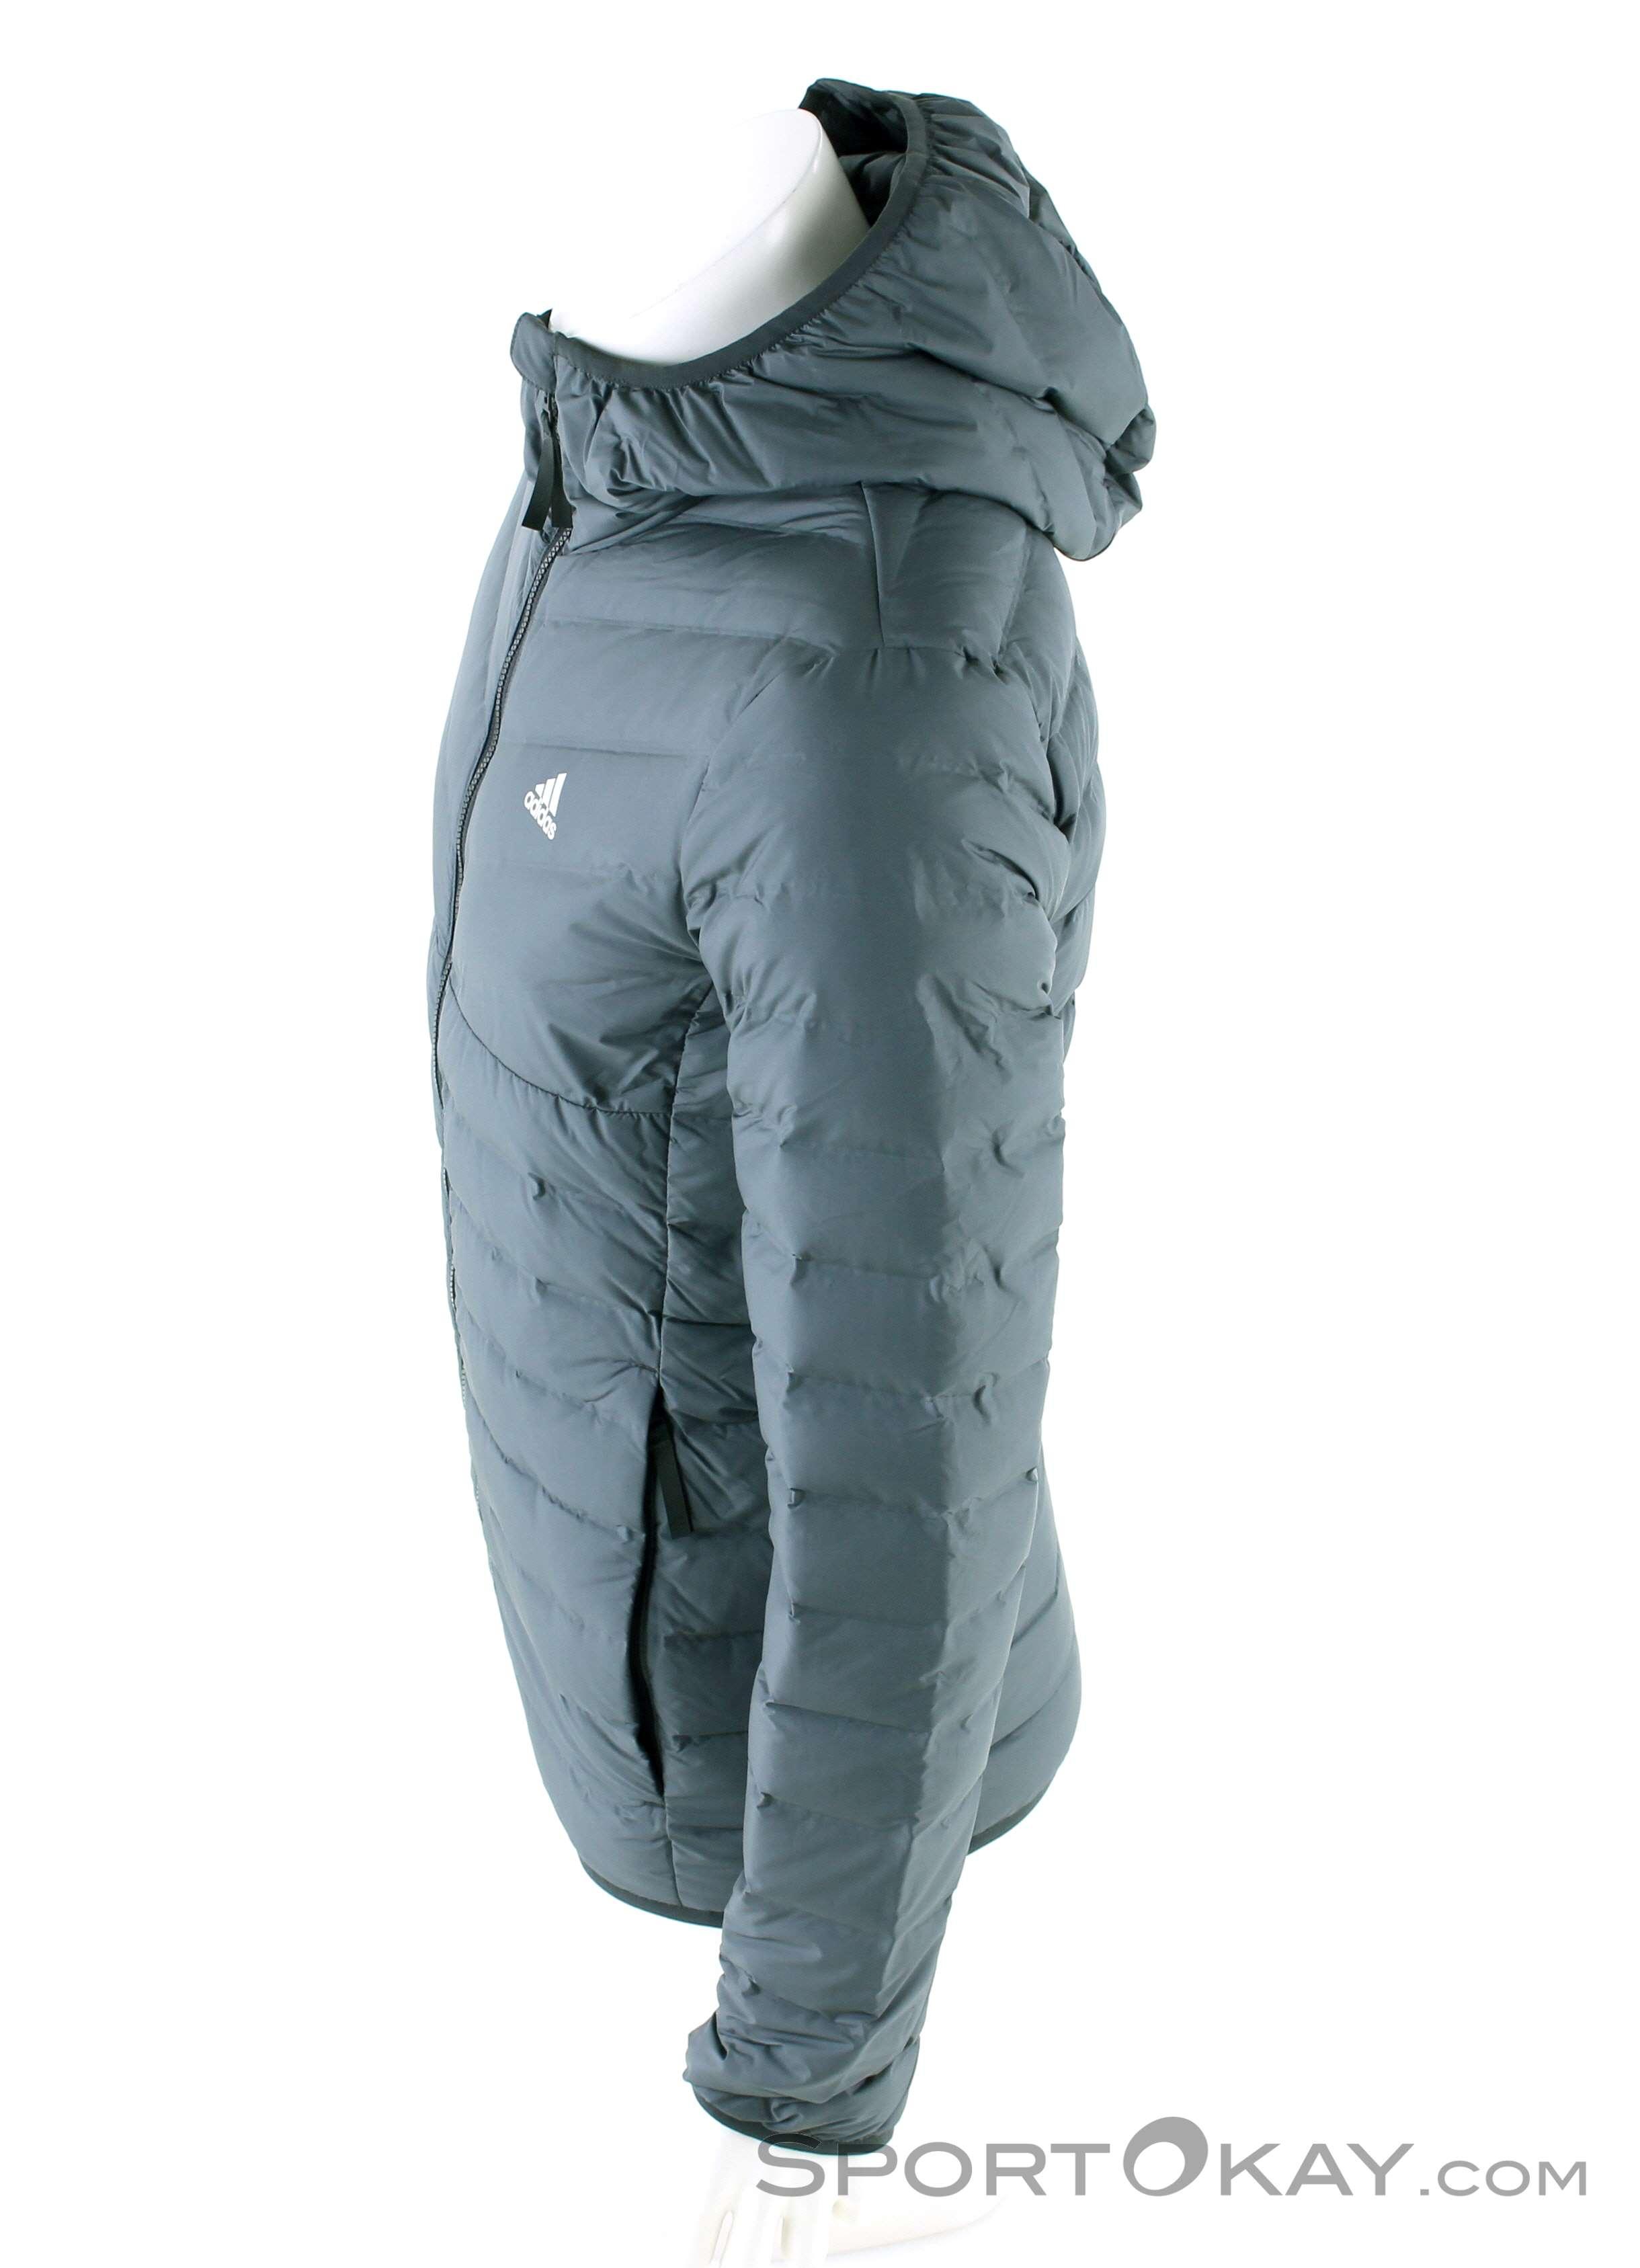 Jacket 3s Herren Adidas Varilite Outdoorjacke VSMUzpq